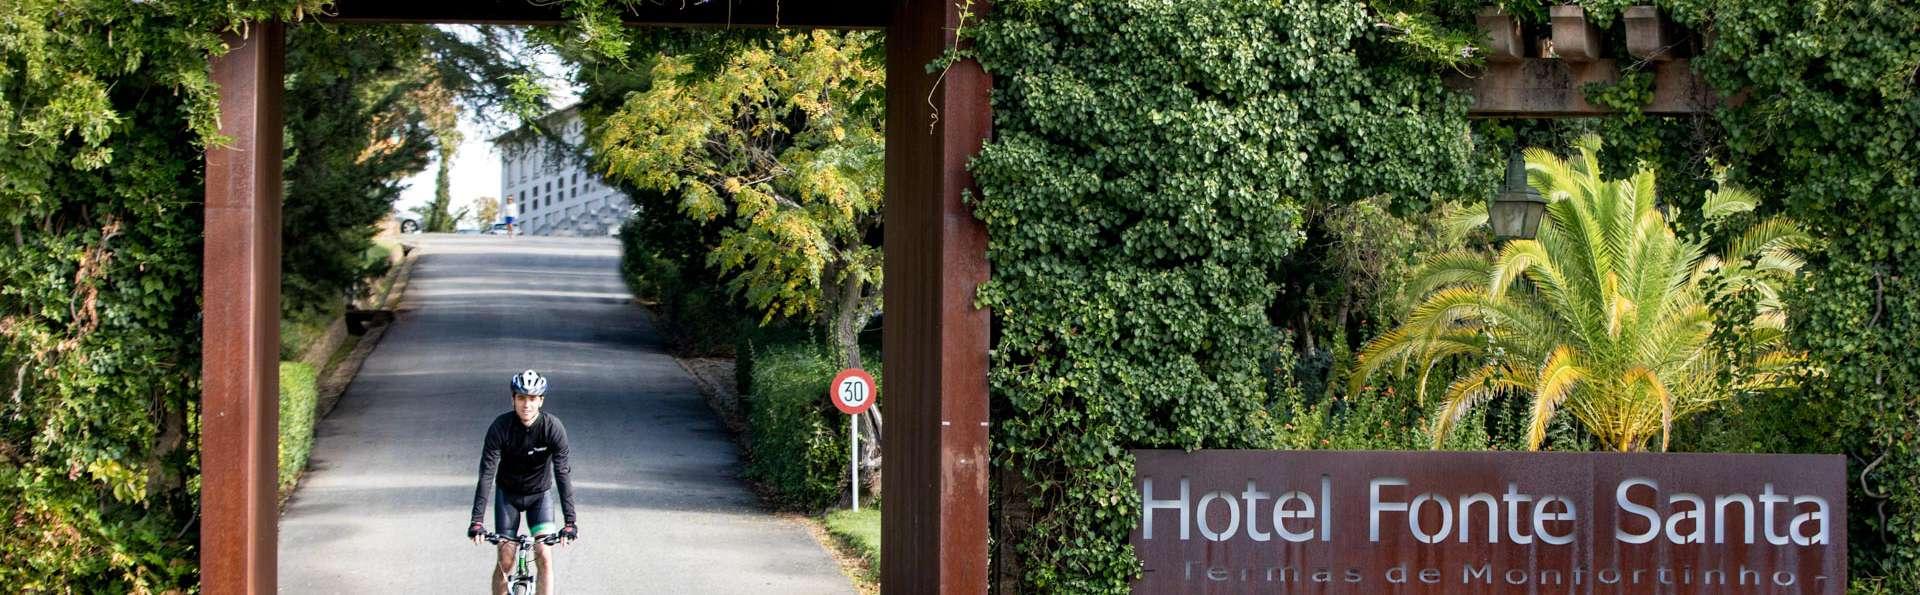 Hotel Fonte Santa - EDIT_FRONT_01.jpg